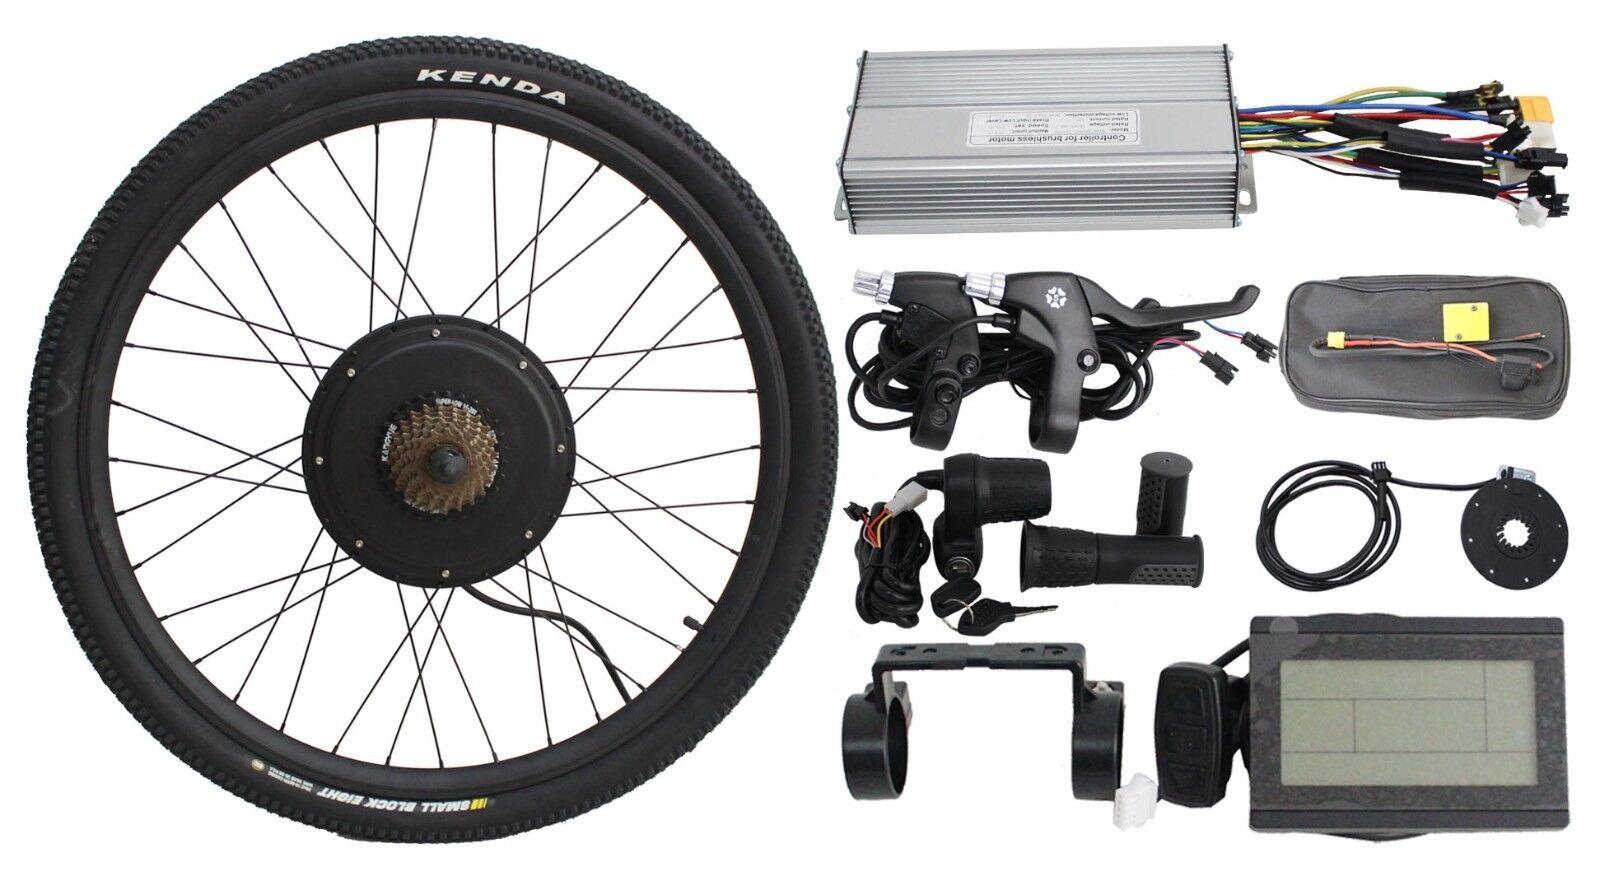 Hallomotor 36v 750w 20 -29  Rear Wheel  Ebike Conversion Kit Controller + Display  the cheapest